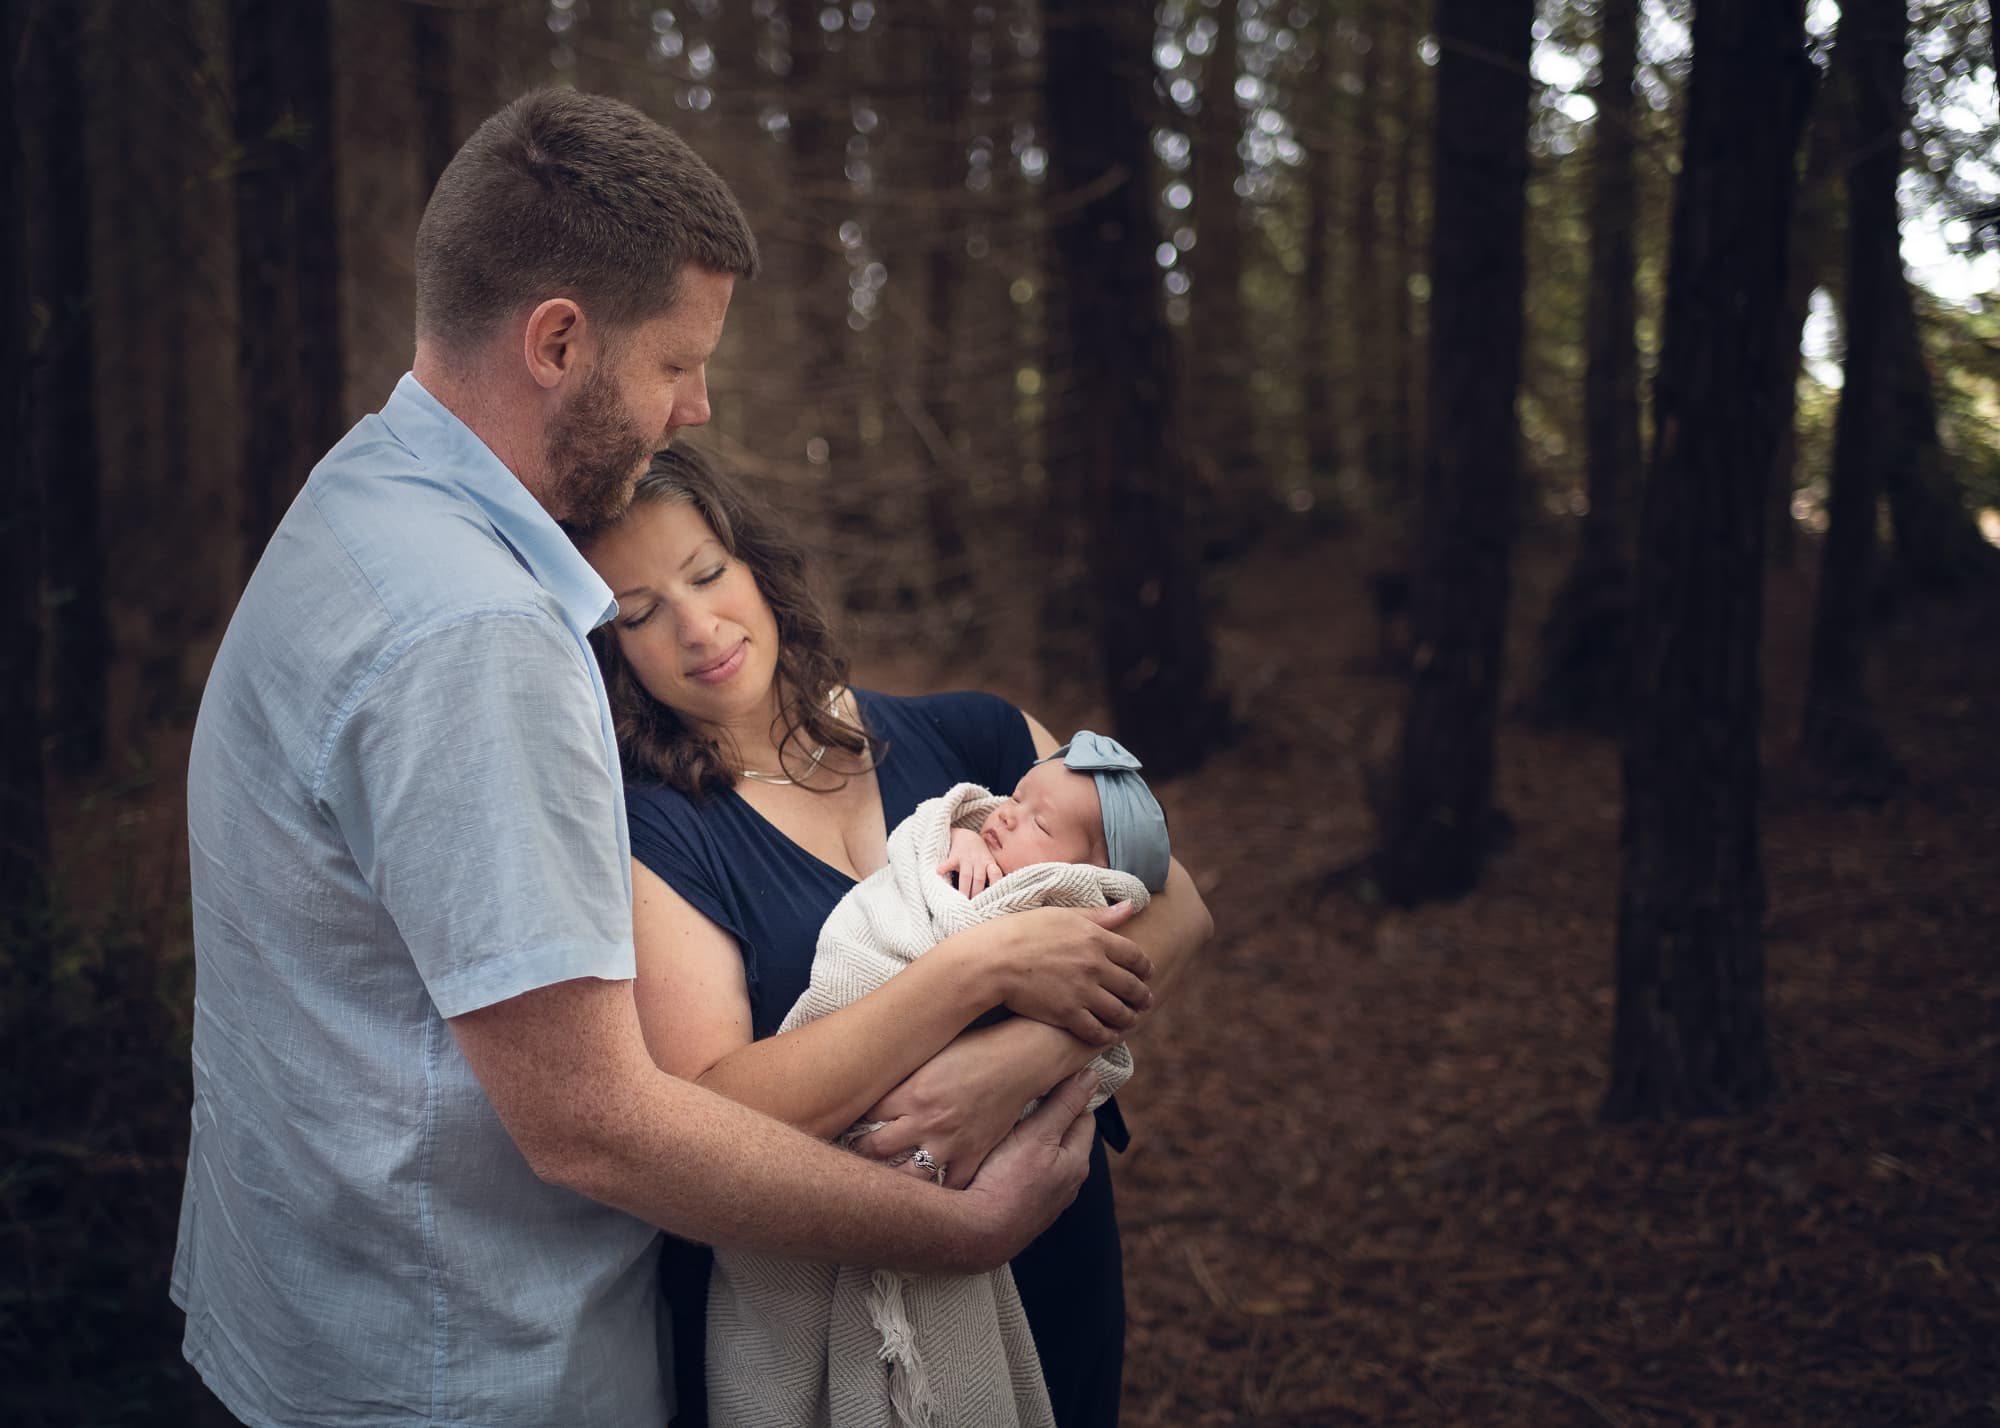 Newborn photography outdoors